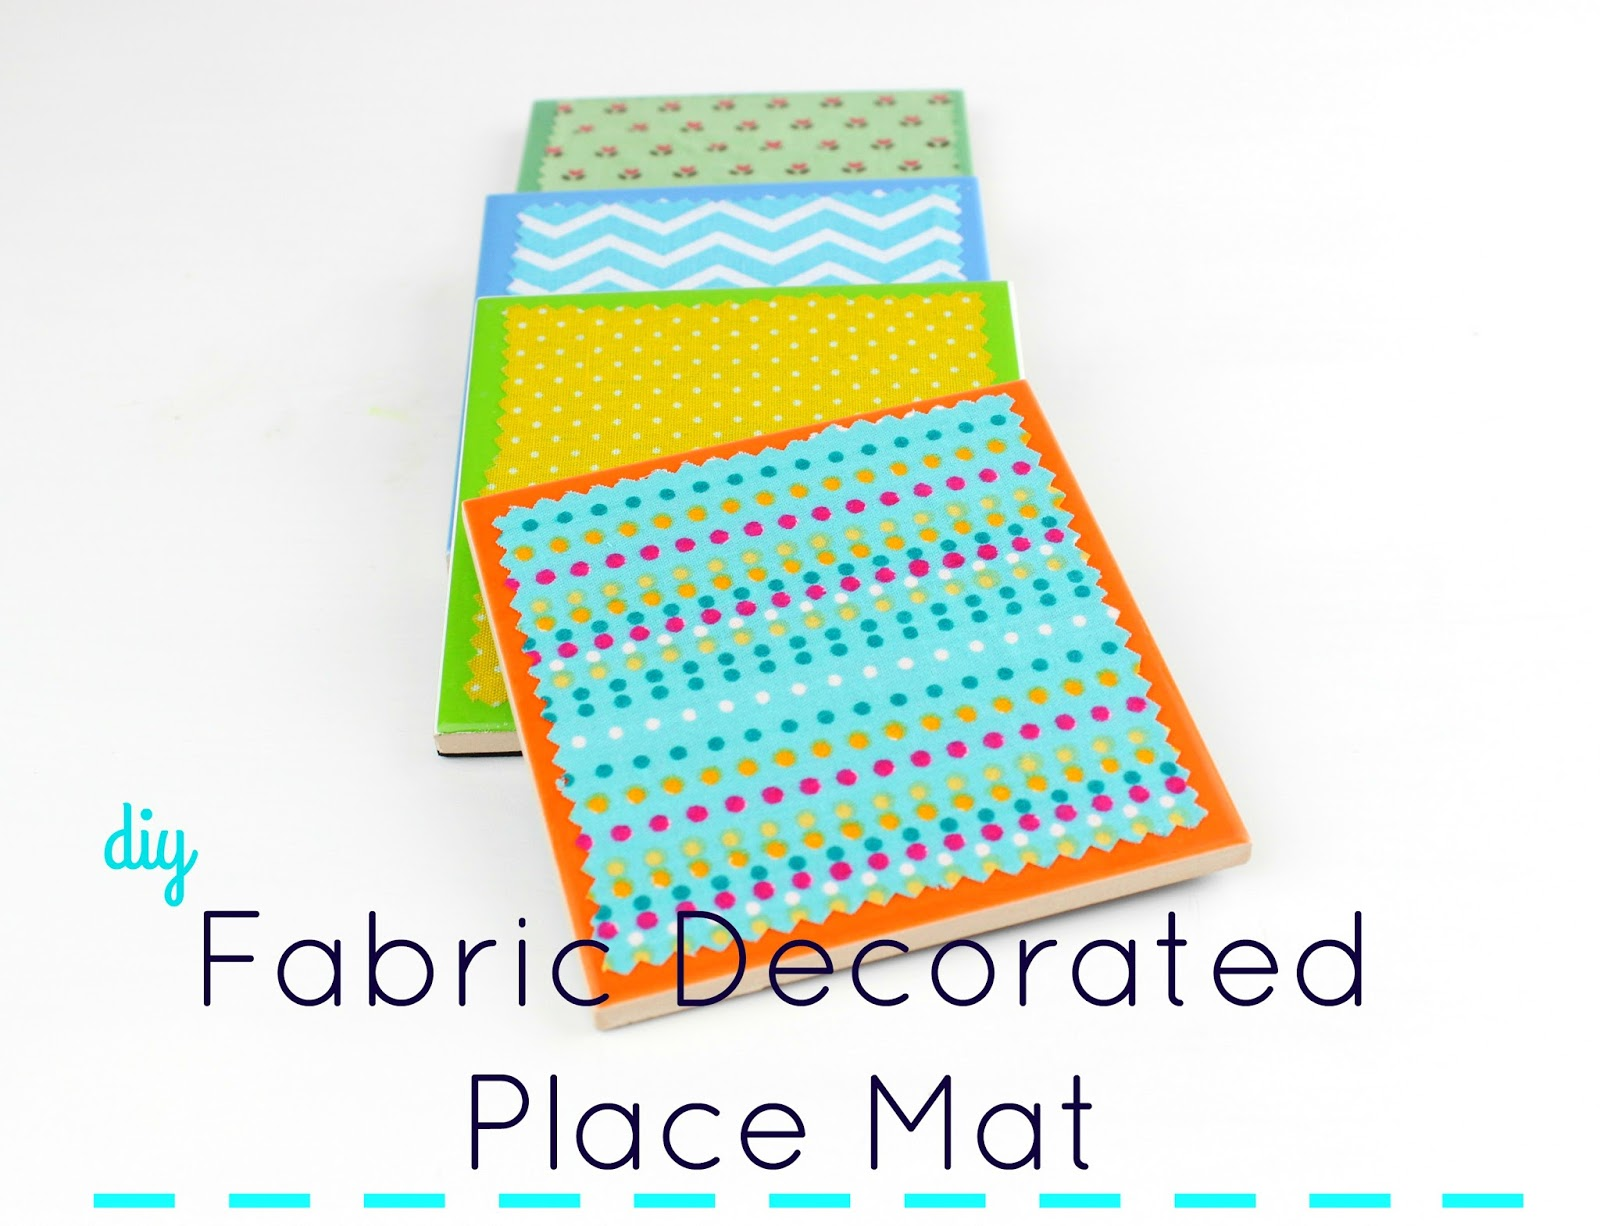 Diy Fabric Decorated Place Mat!!!  a406e596ebb